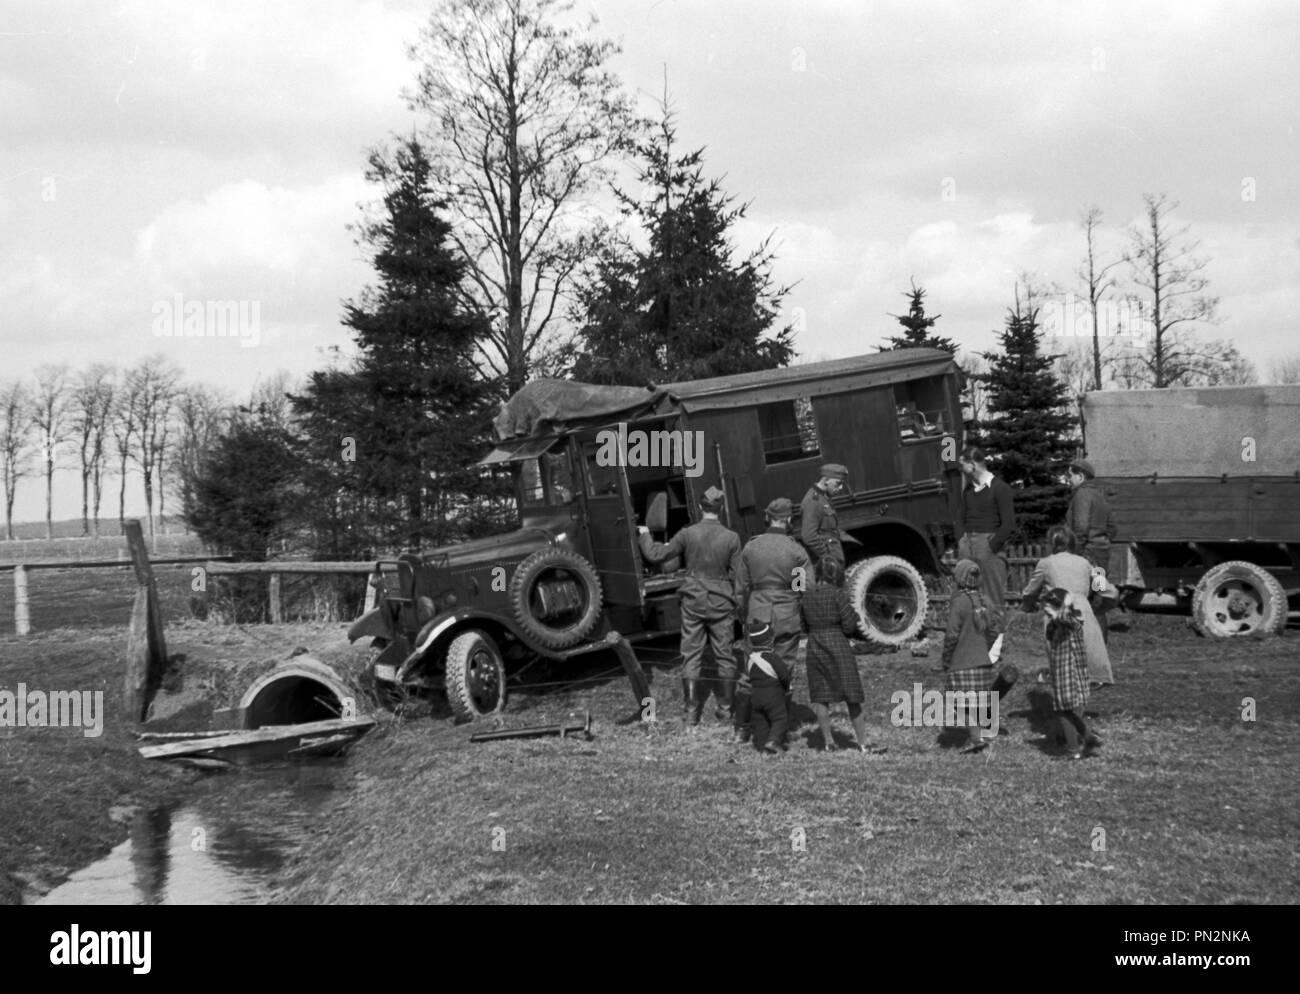 Beutefahrzeug des Heeres der Wehrmacht Unic P 107 - Loot vehicle of the German Army Unic P107 Stock Photo